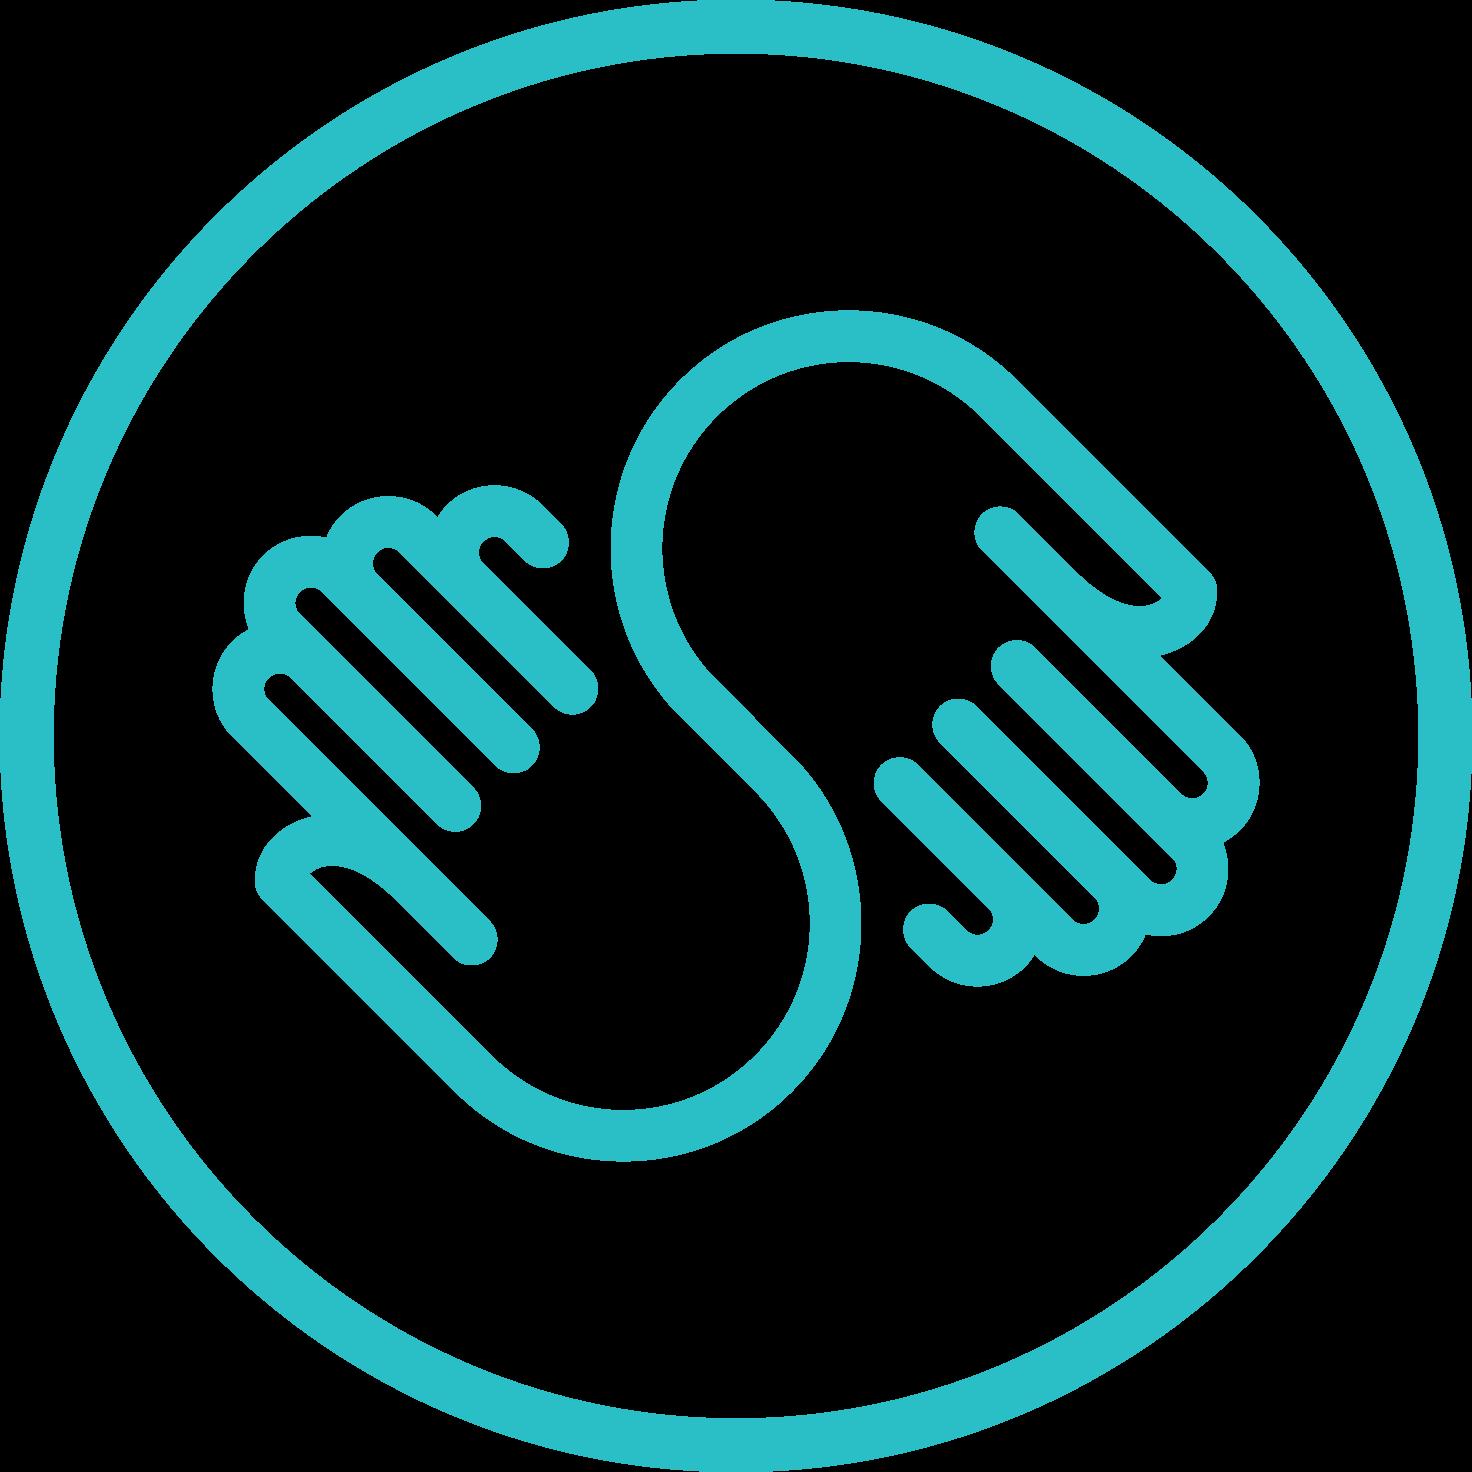 Skillshare Reviews | Read Customer Service Reviews of